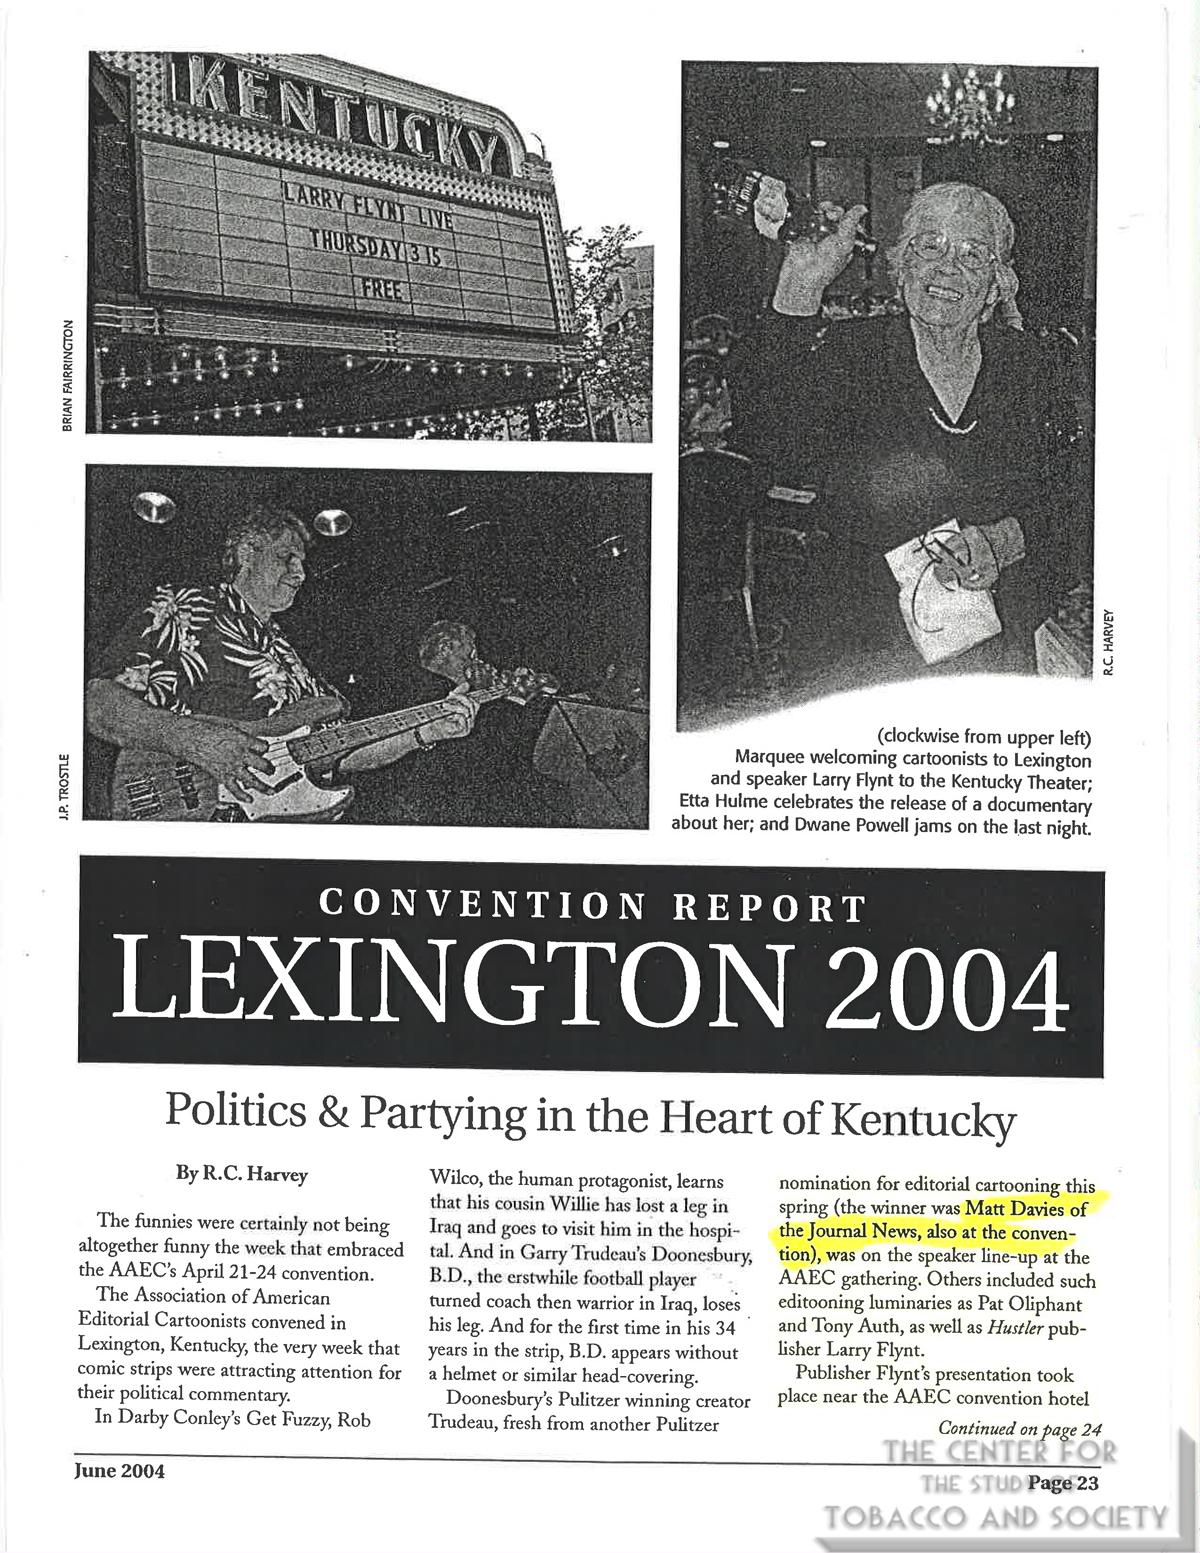 2004 06 AAEC Notebook Convention Report Lexington Kentucky